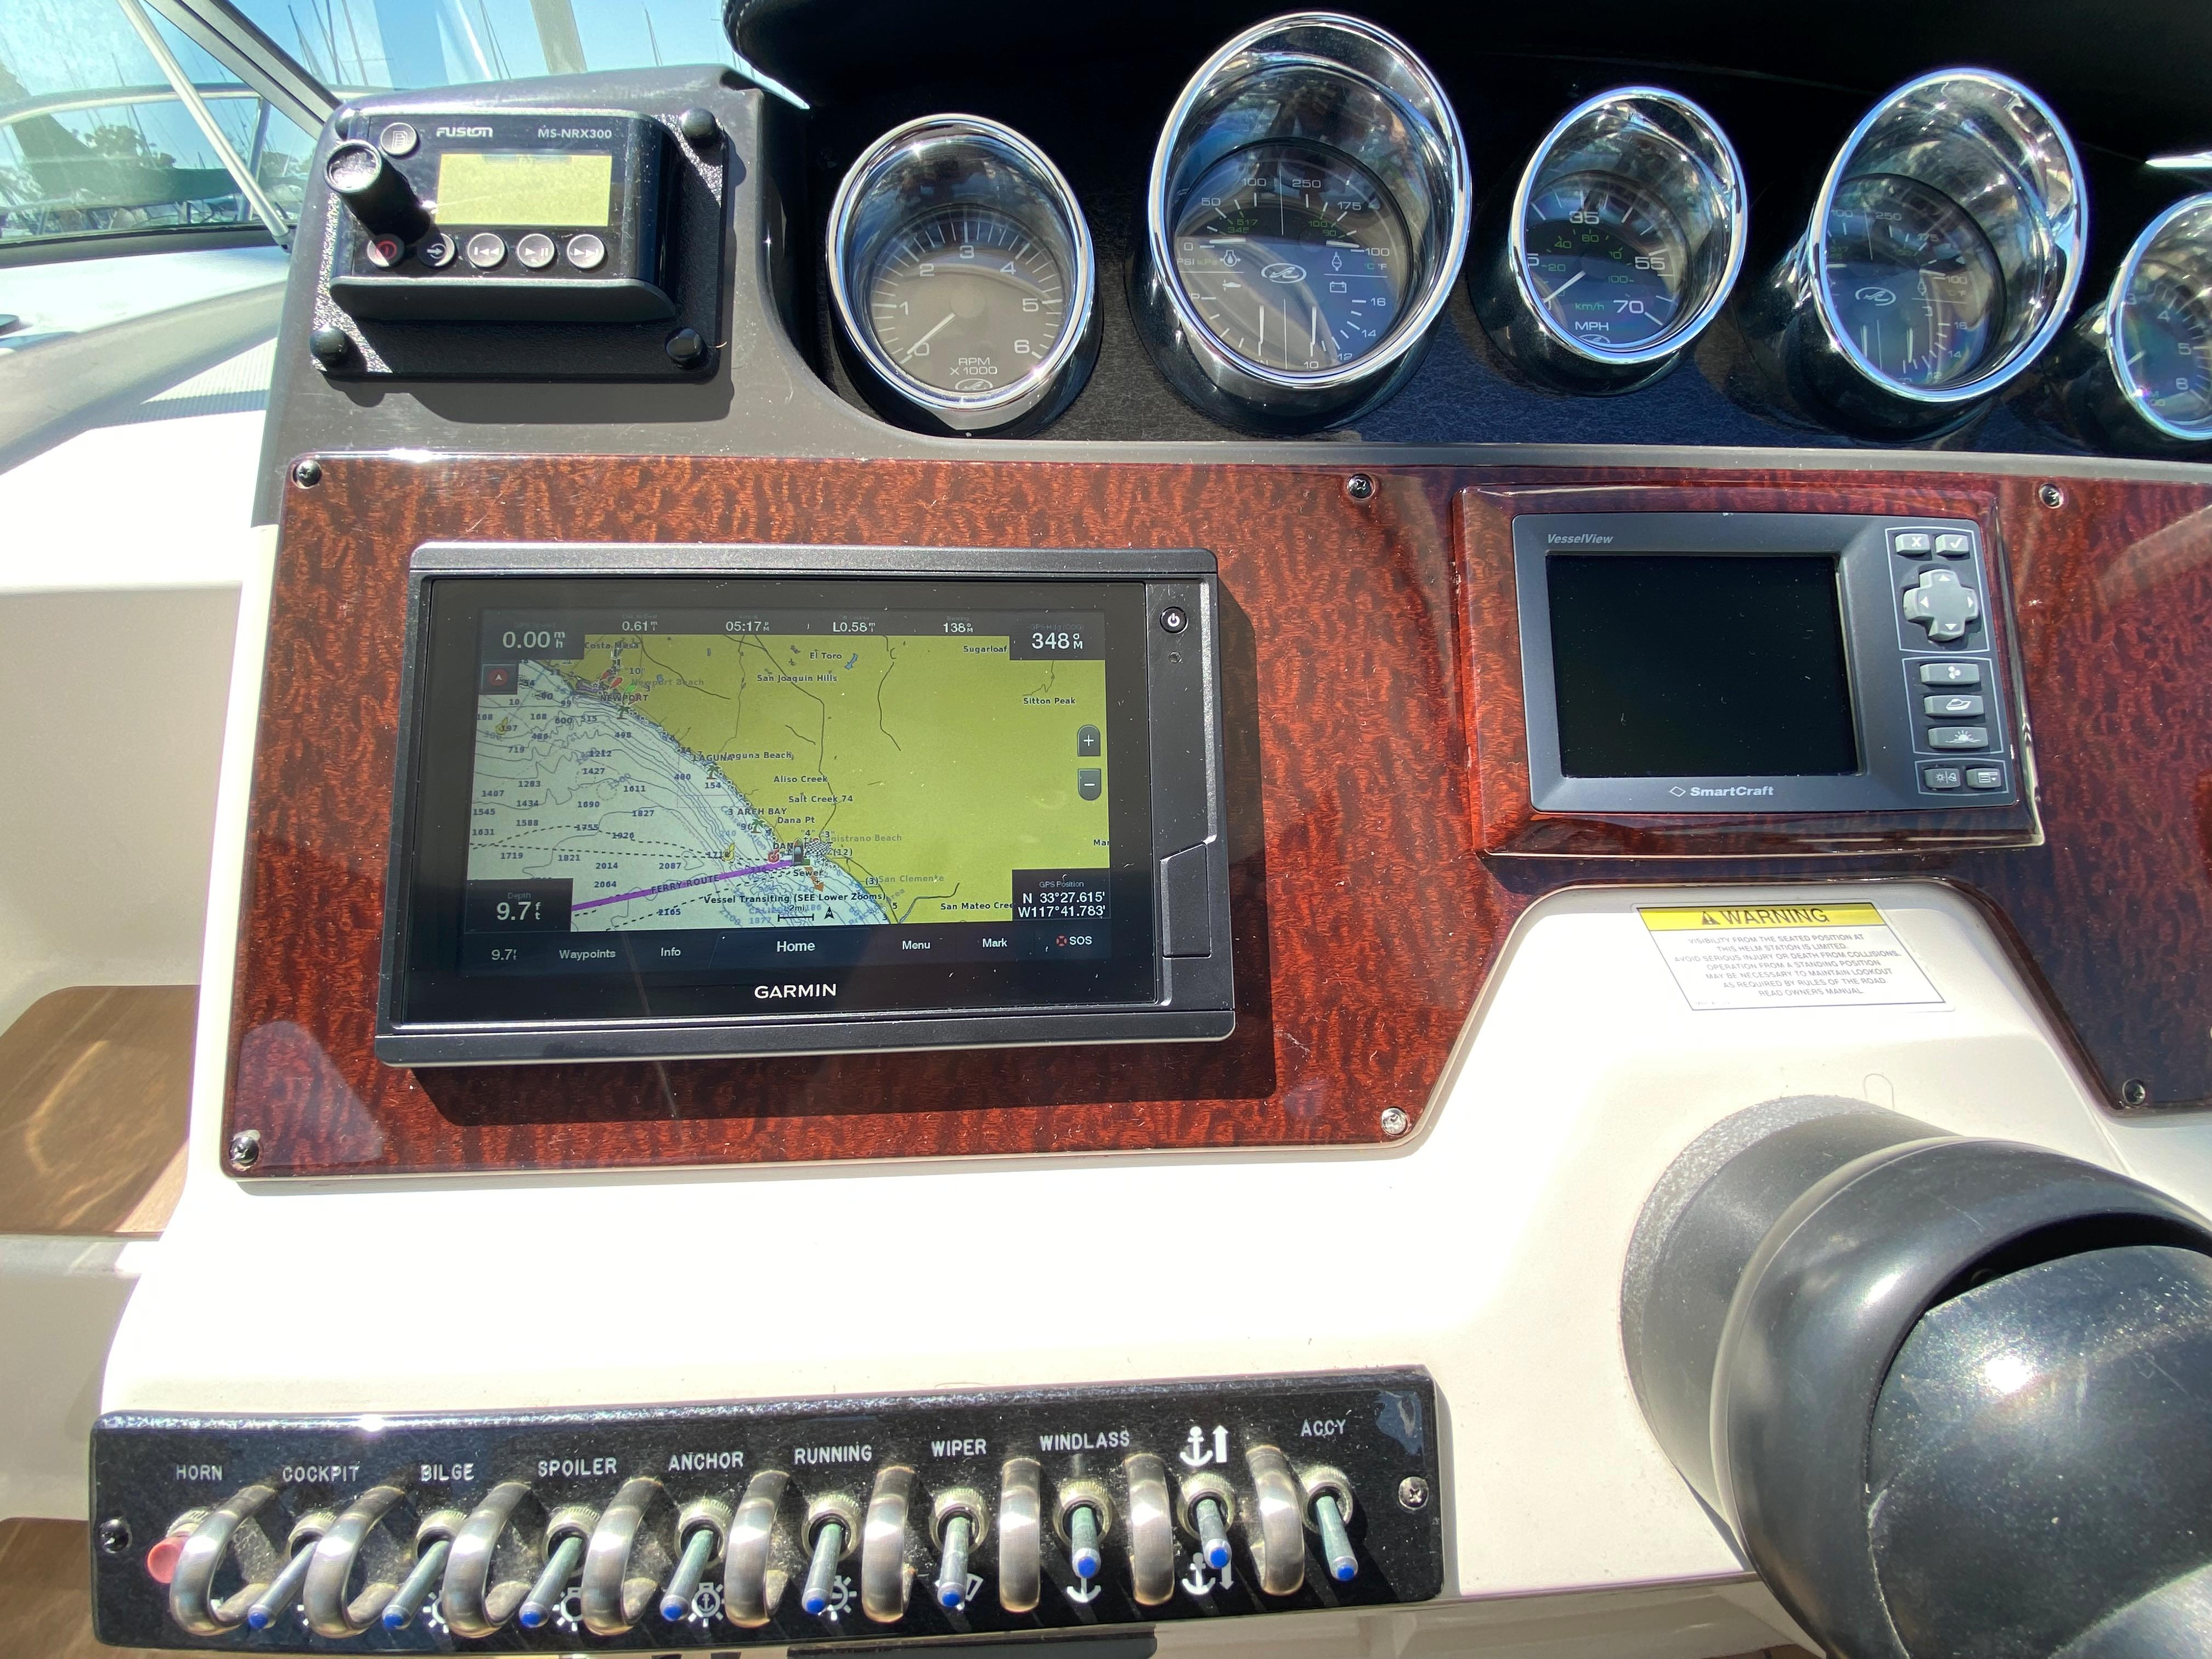 2013 Sea Ray 310 Sundancer #TB1759MC inventory image at Sun Country Coastal in Dana Point